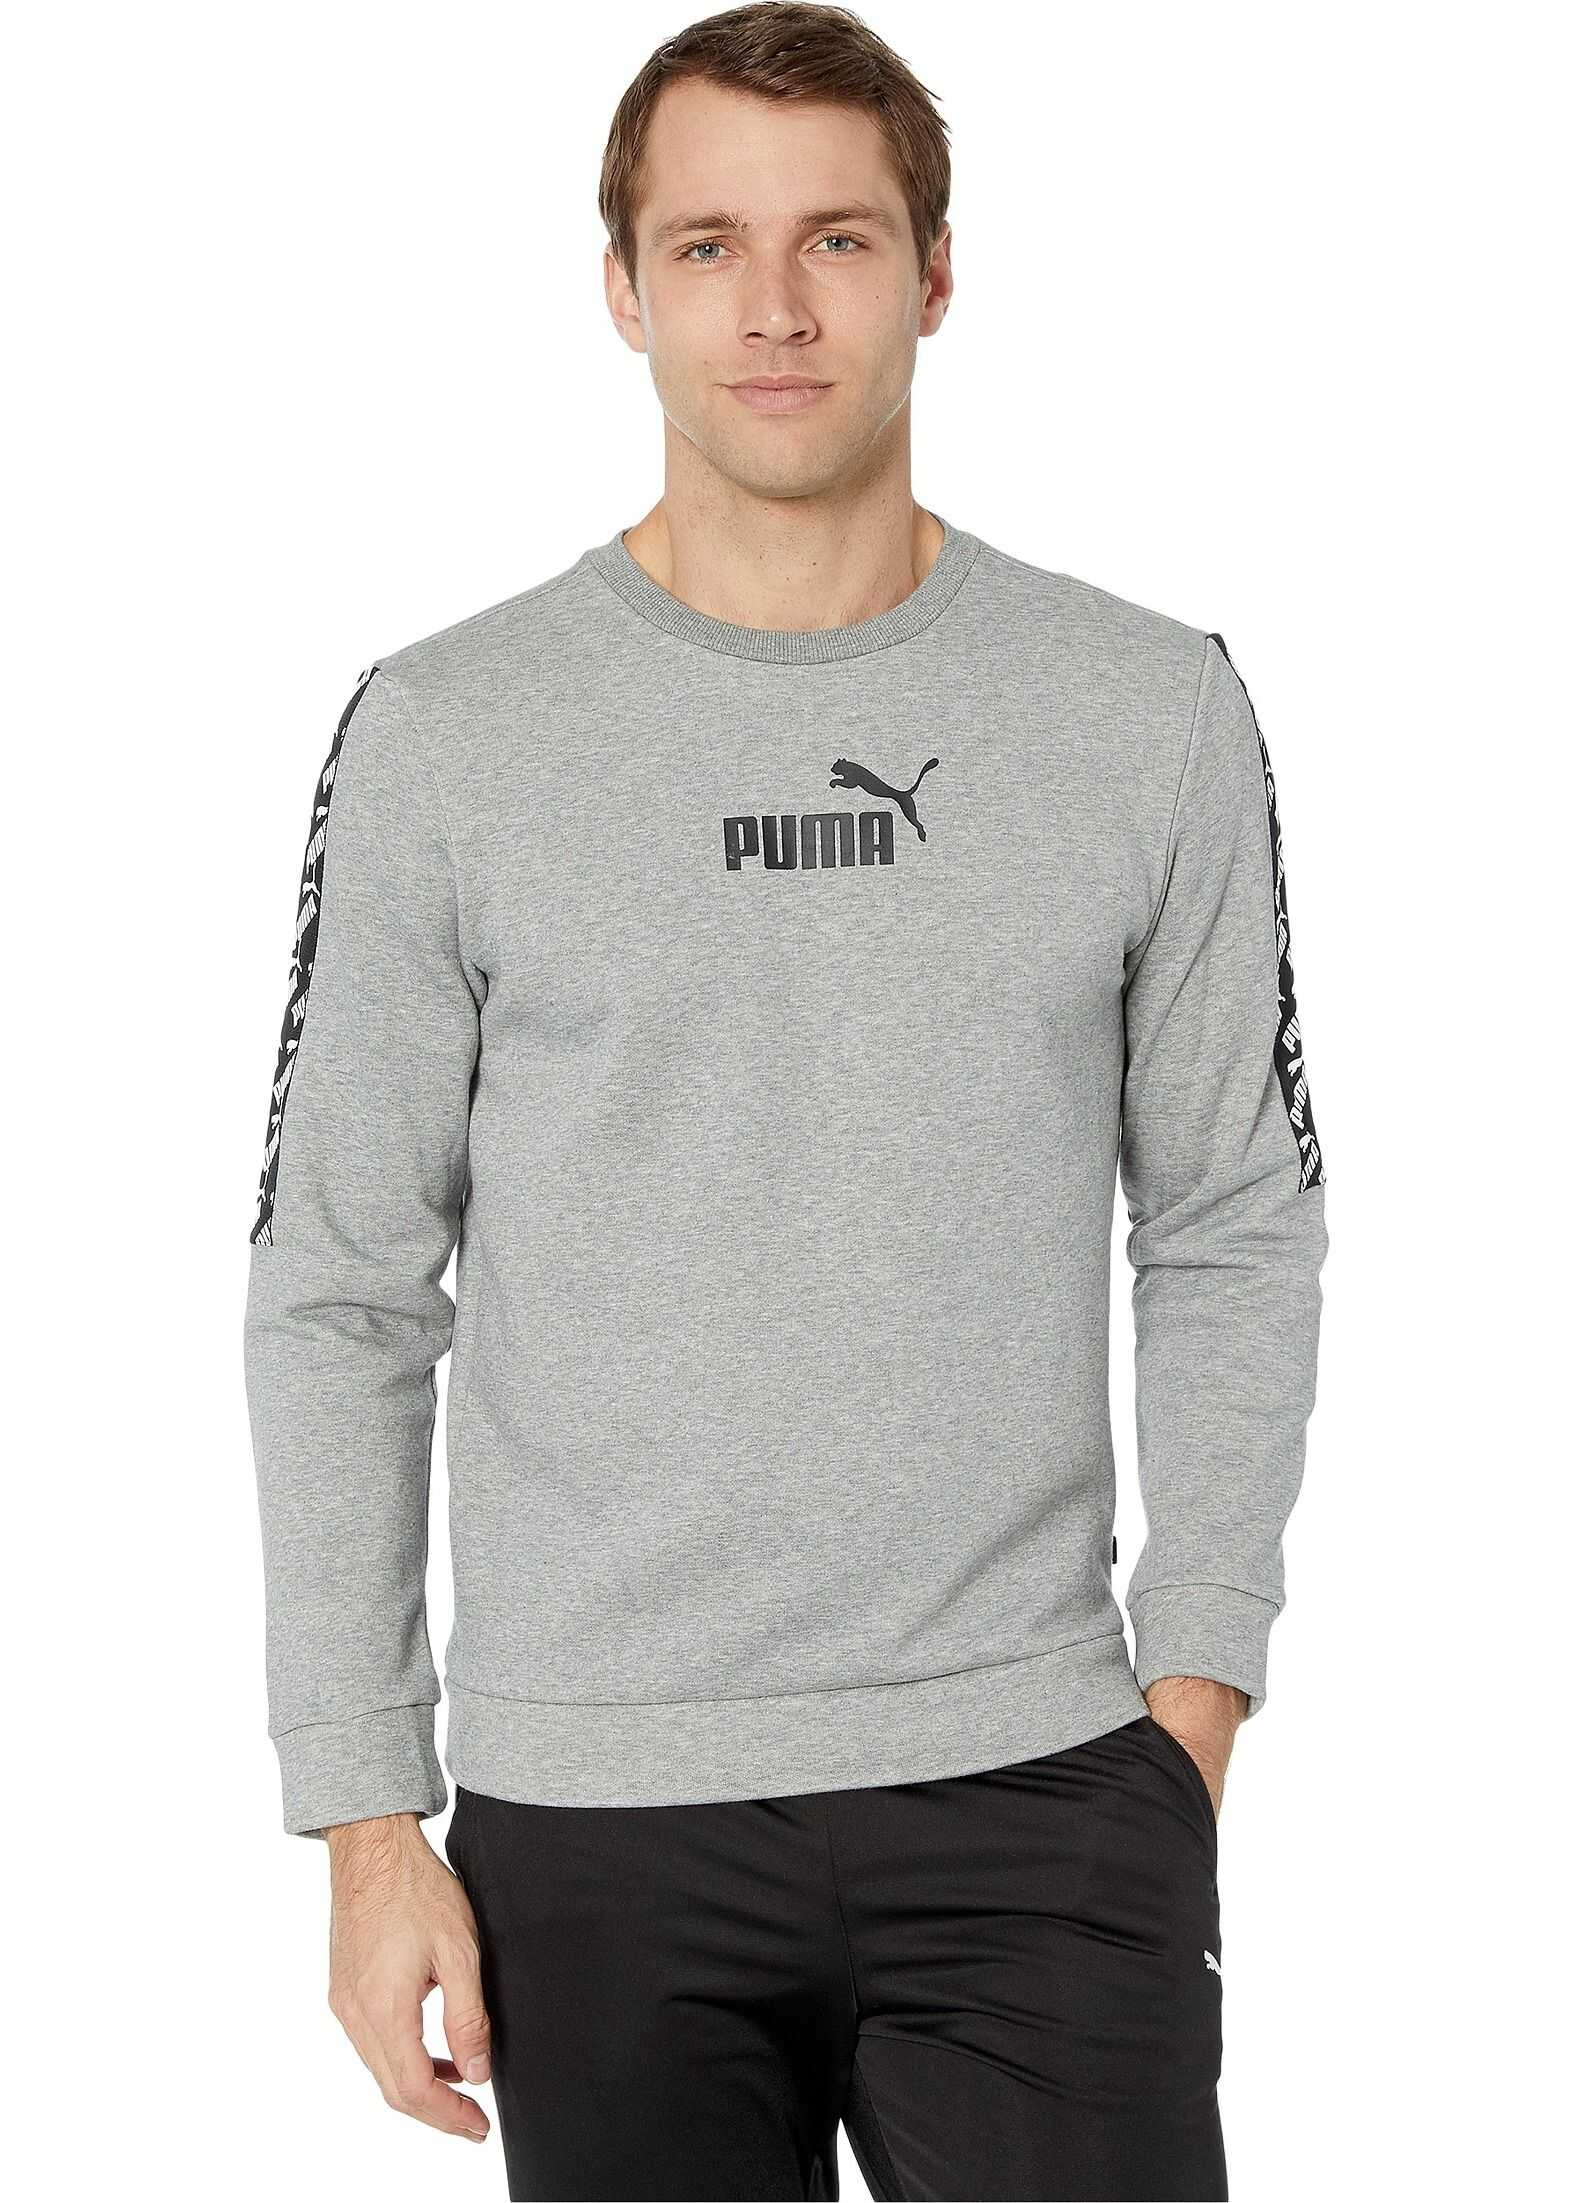 PUMA Amplified Fleece Crew Medium Grey Heather